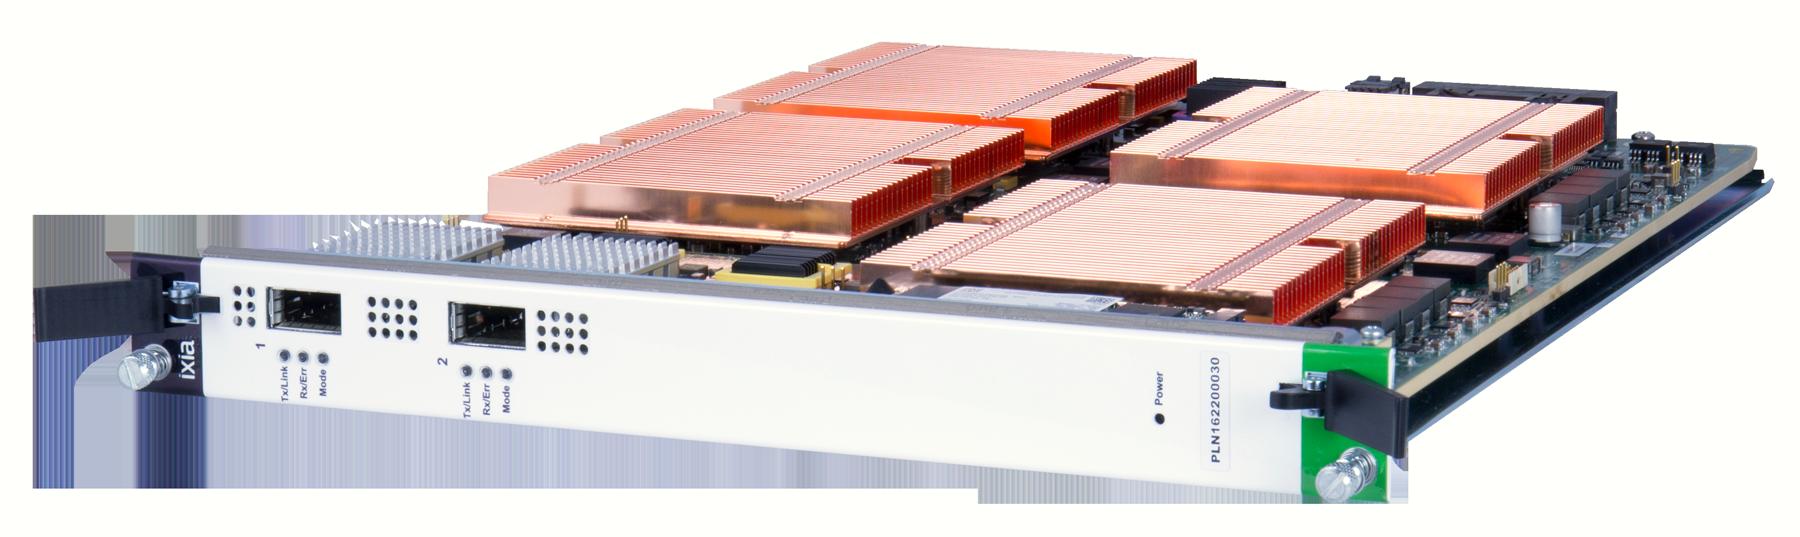 Ixia a extins paltforma CloudStorm cu prima solutie 25GE